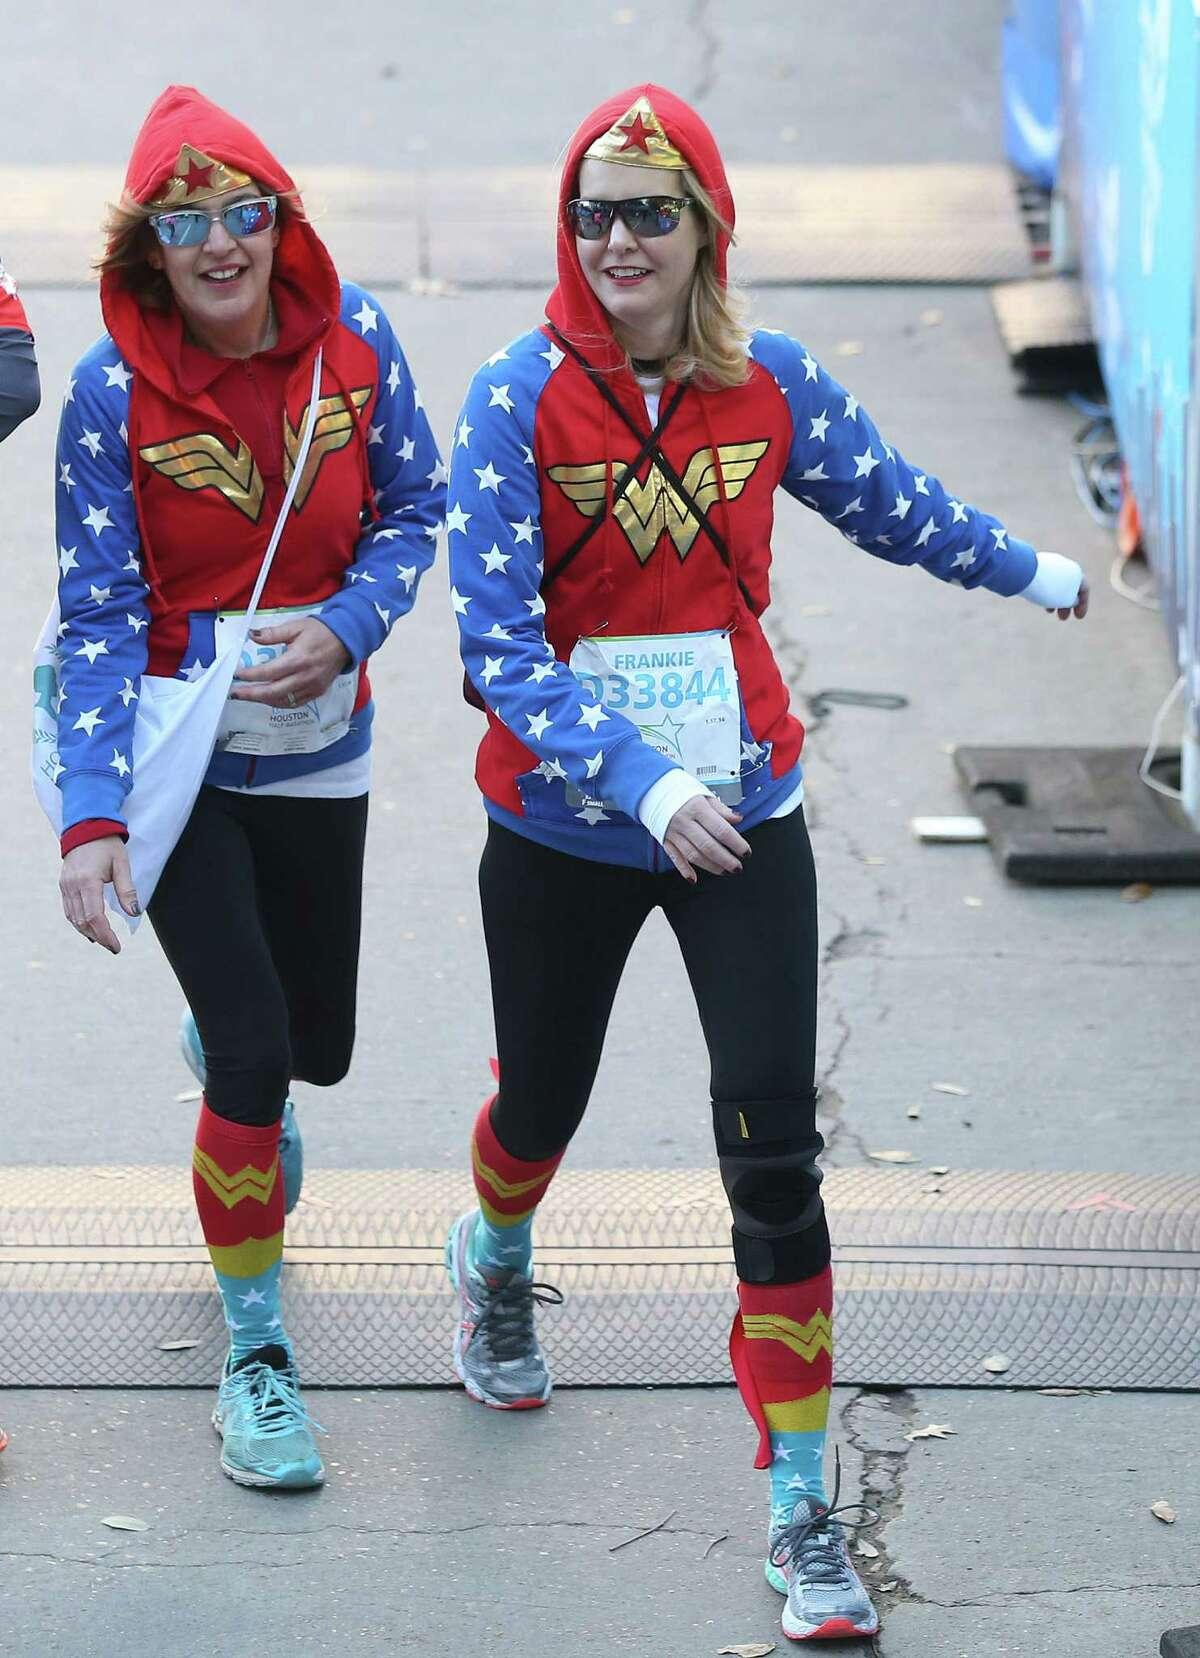 Ashley Day, left, and Frankie Cox wear wonder woman sweatshirts for the half marathon on Sunday, Jan. 17, 2016, in Houston.